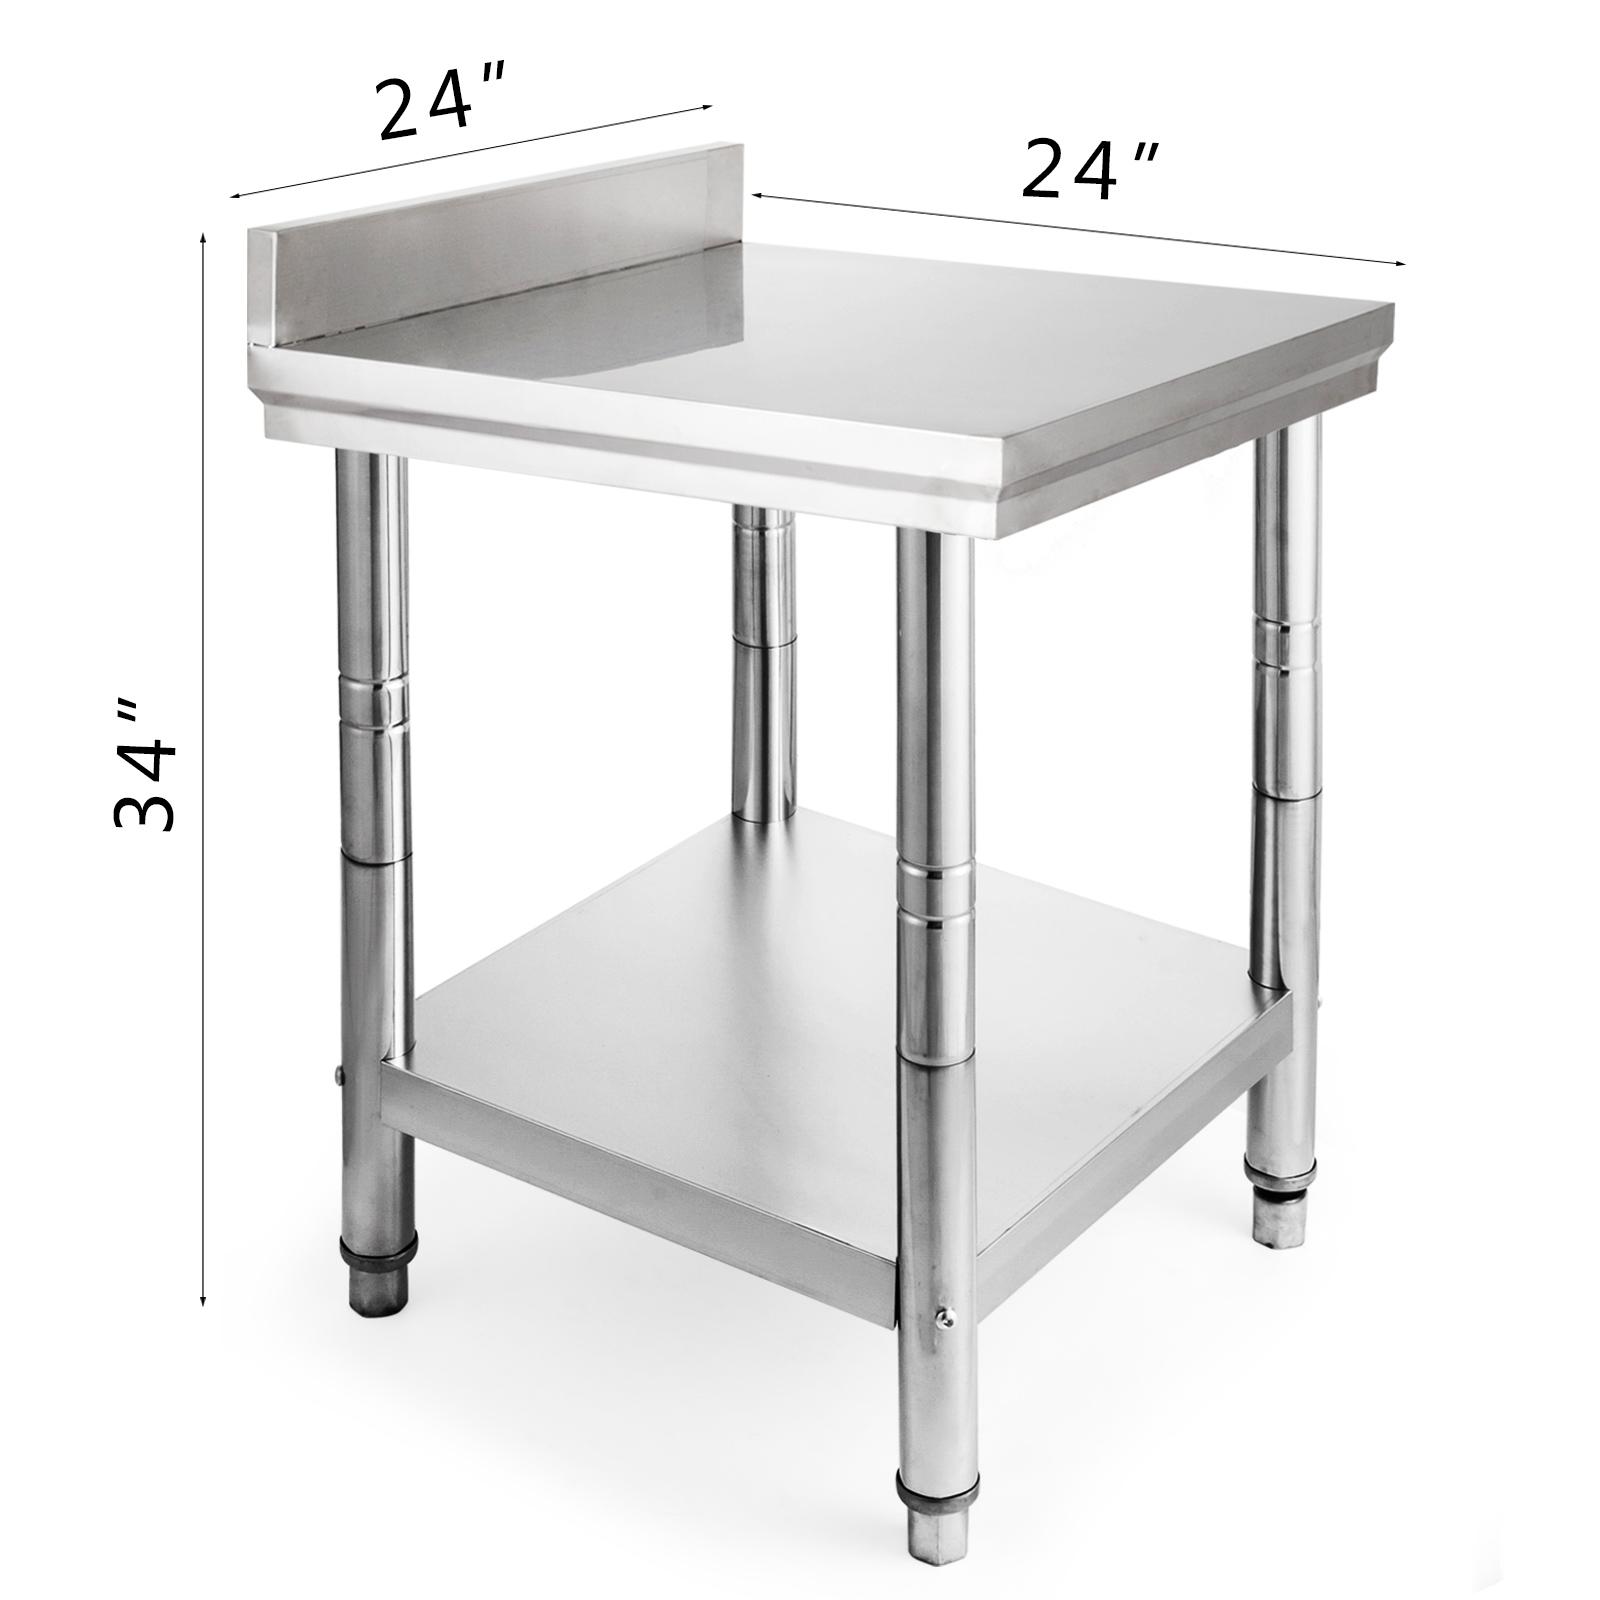 24 X 24 Stainless Steel Kitchen Work Table Commercial Kitchen Restaurant 2472 Ebay